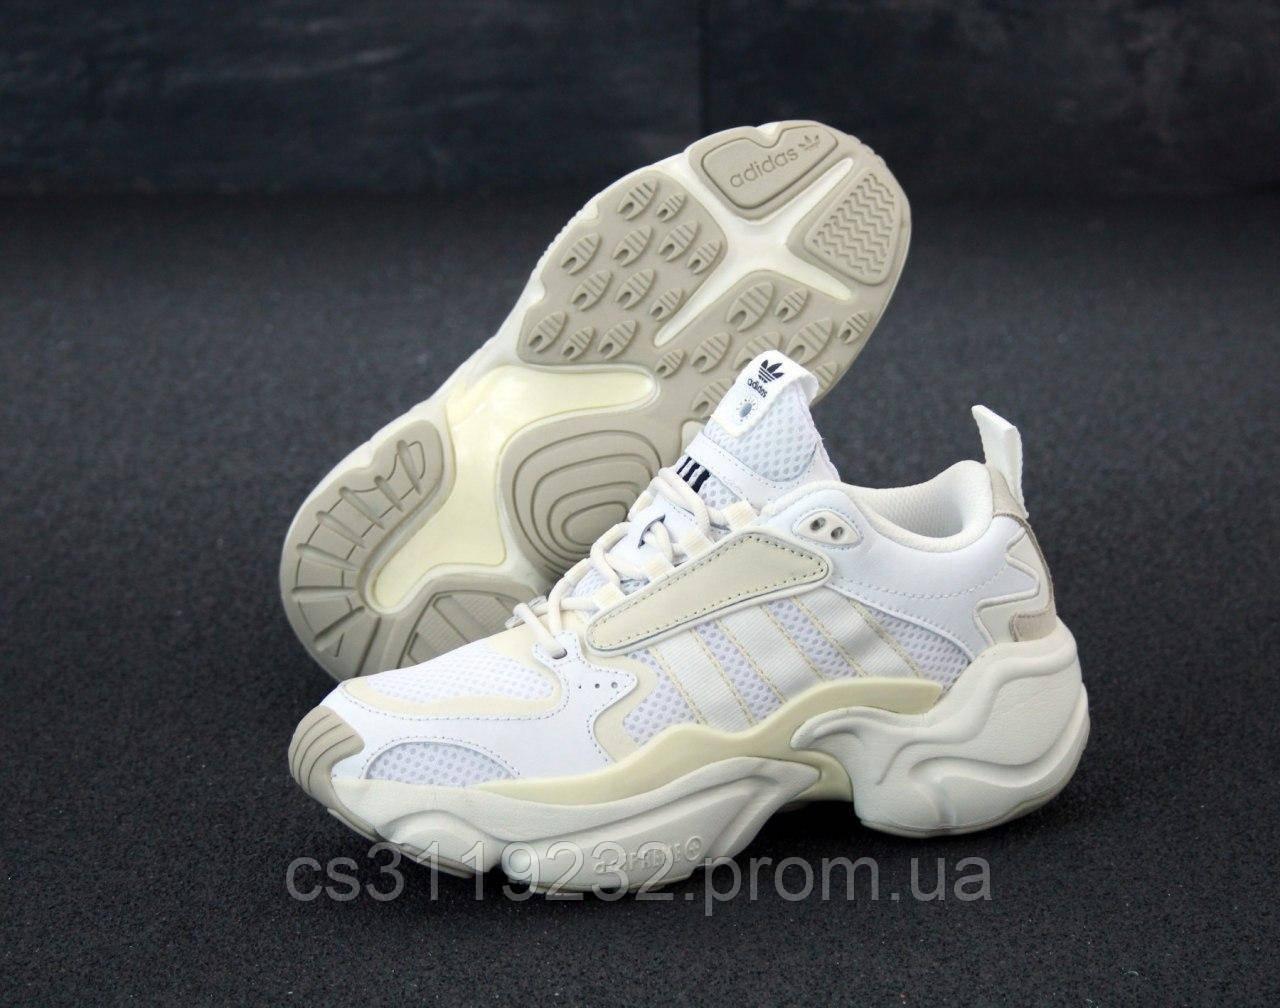 Женские кроссовки Adidas Naked Magmur Runner Cream White (белые)